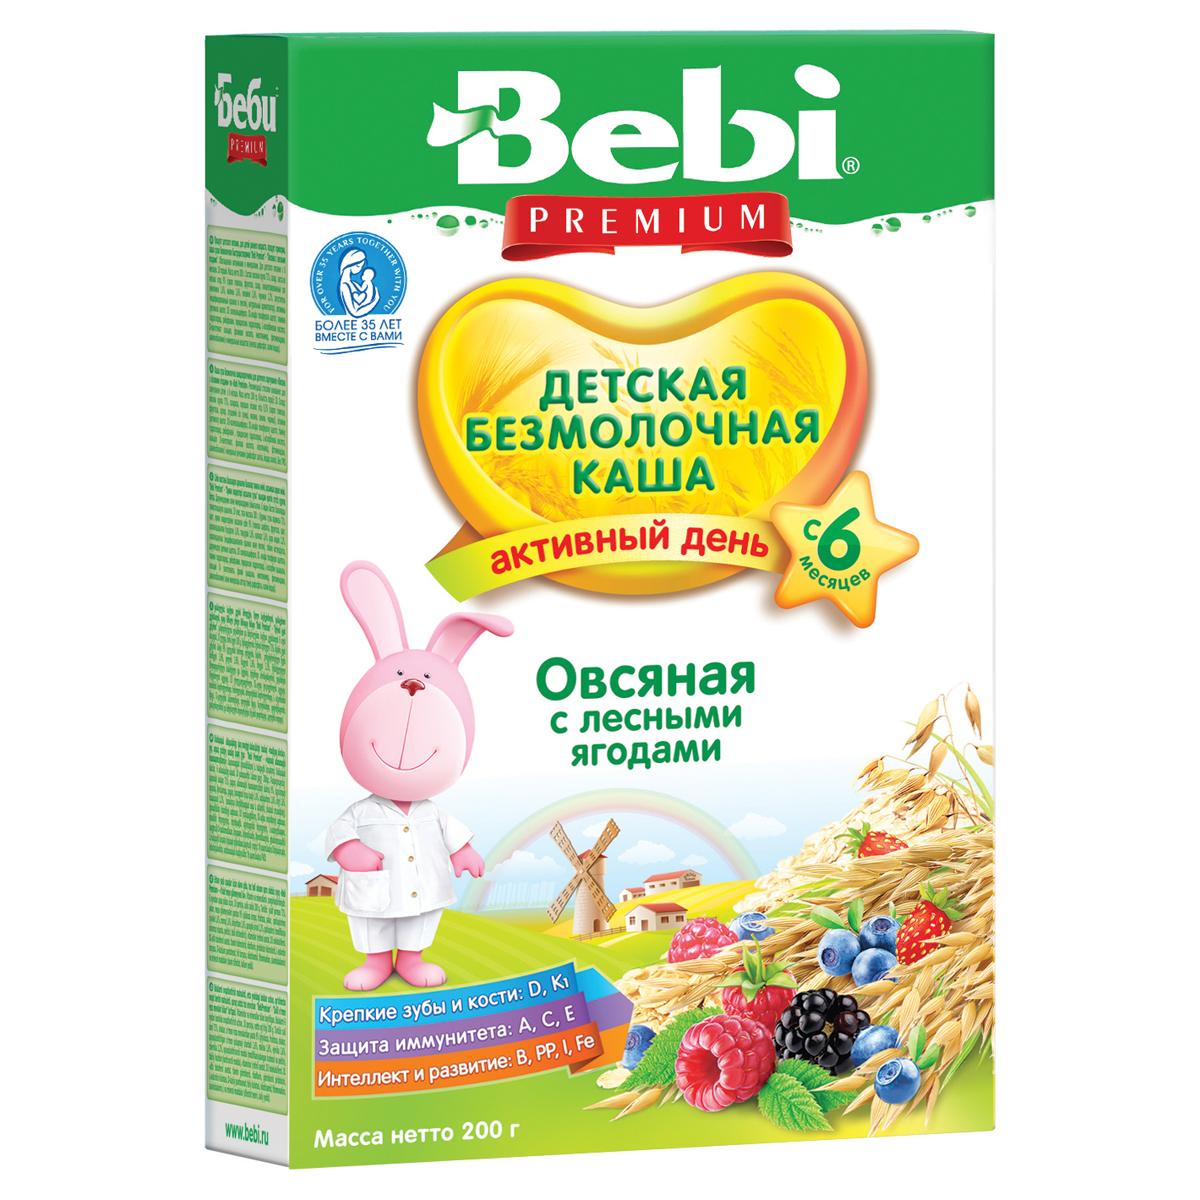 Каша Bebi безмолочная 200 гр Овсяная с лесными ягодами (с 6 мес)<br>